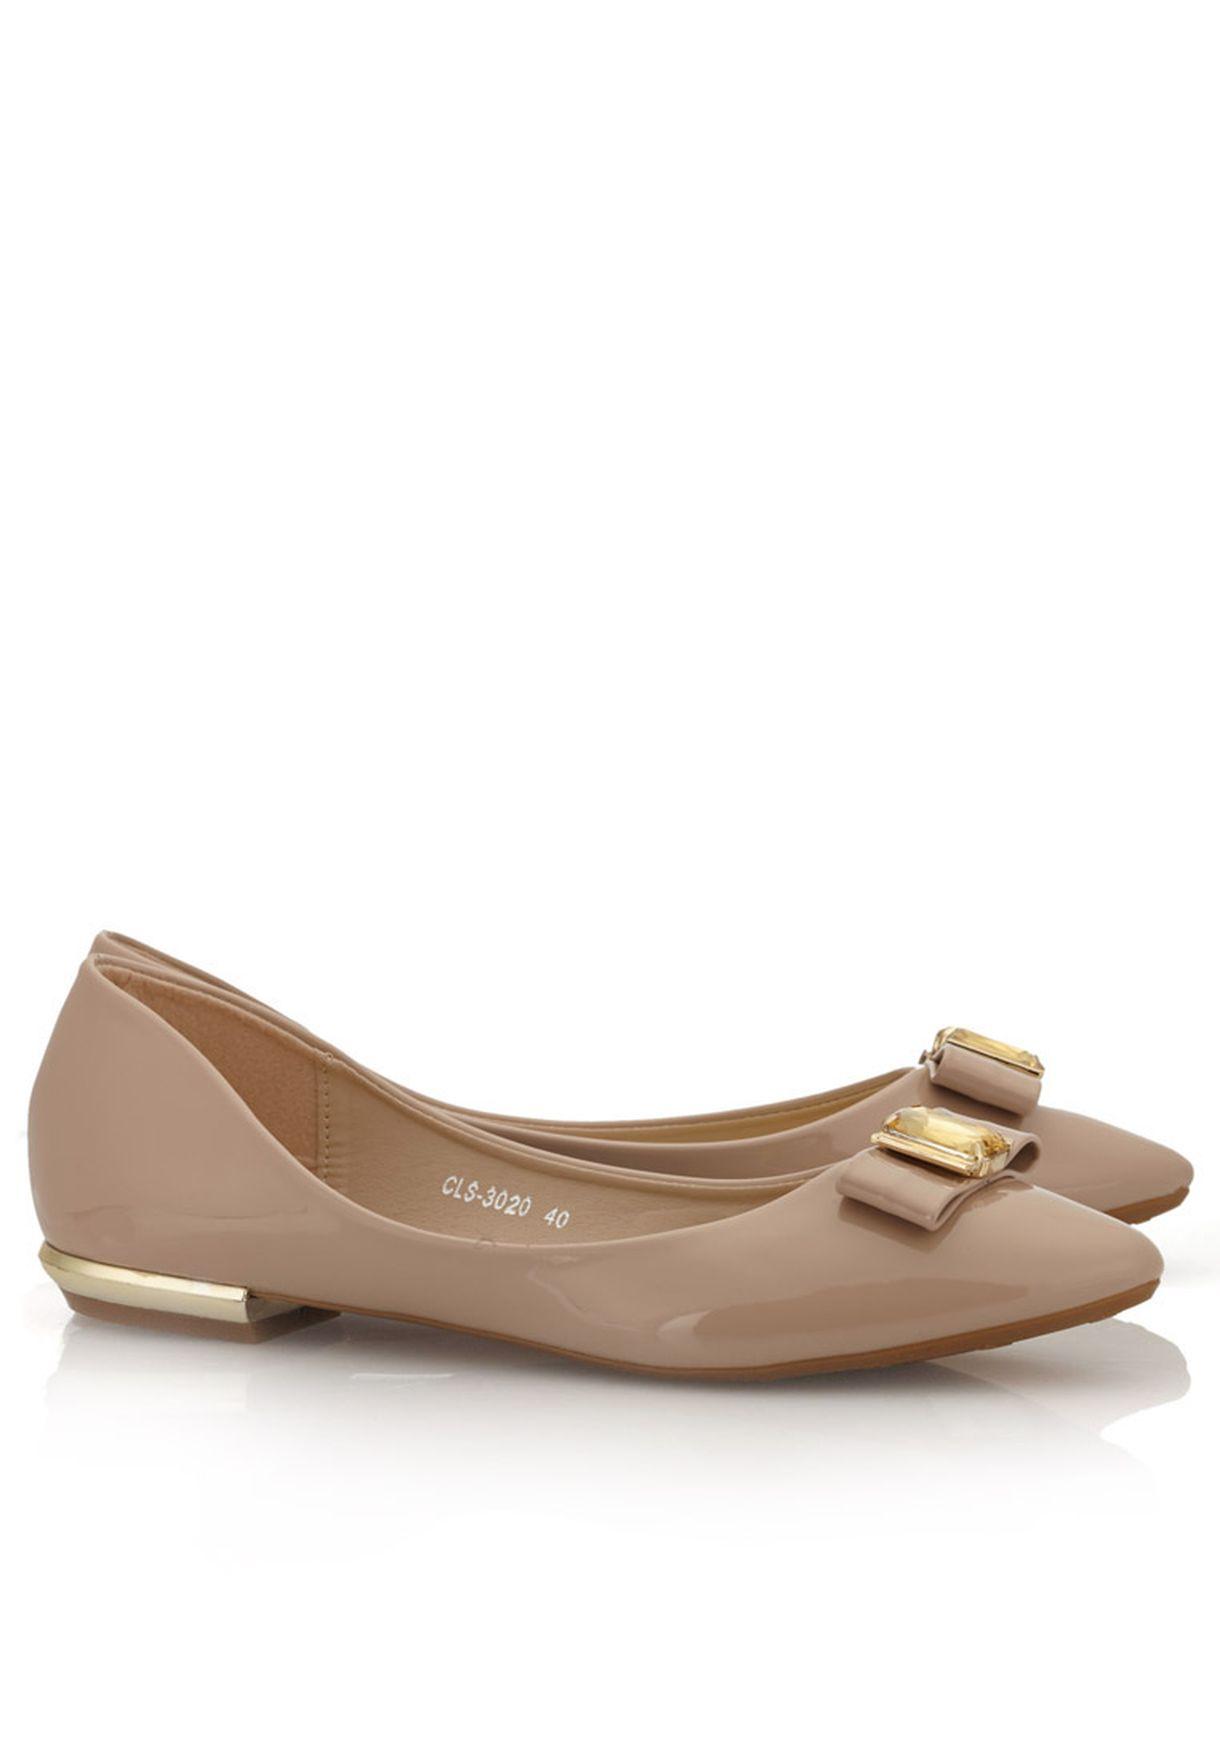 2d62a7679 تسوق حذاء فلات ببروش ماركة كلاوس لون بيج في قطر - CL530SH14MCR